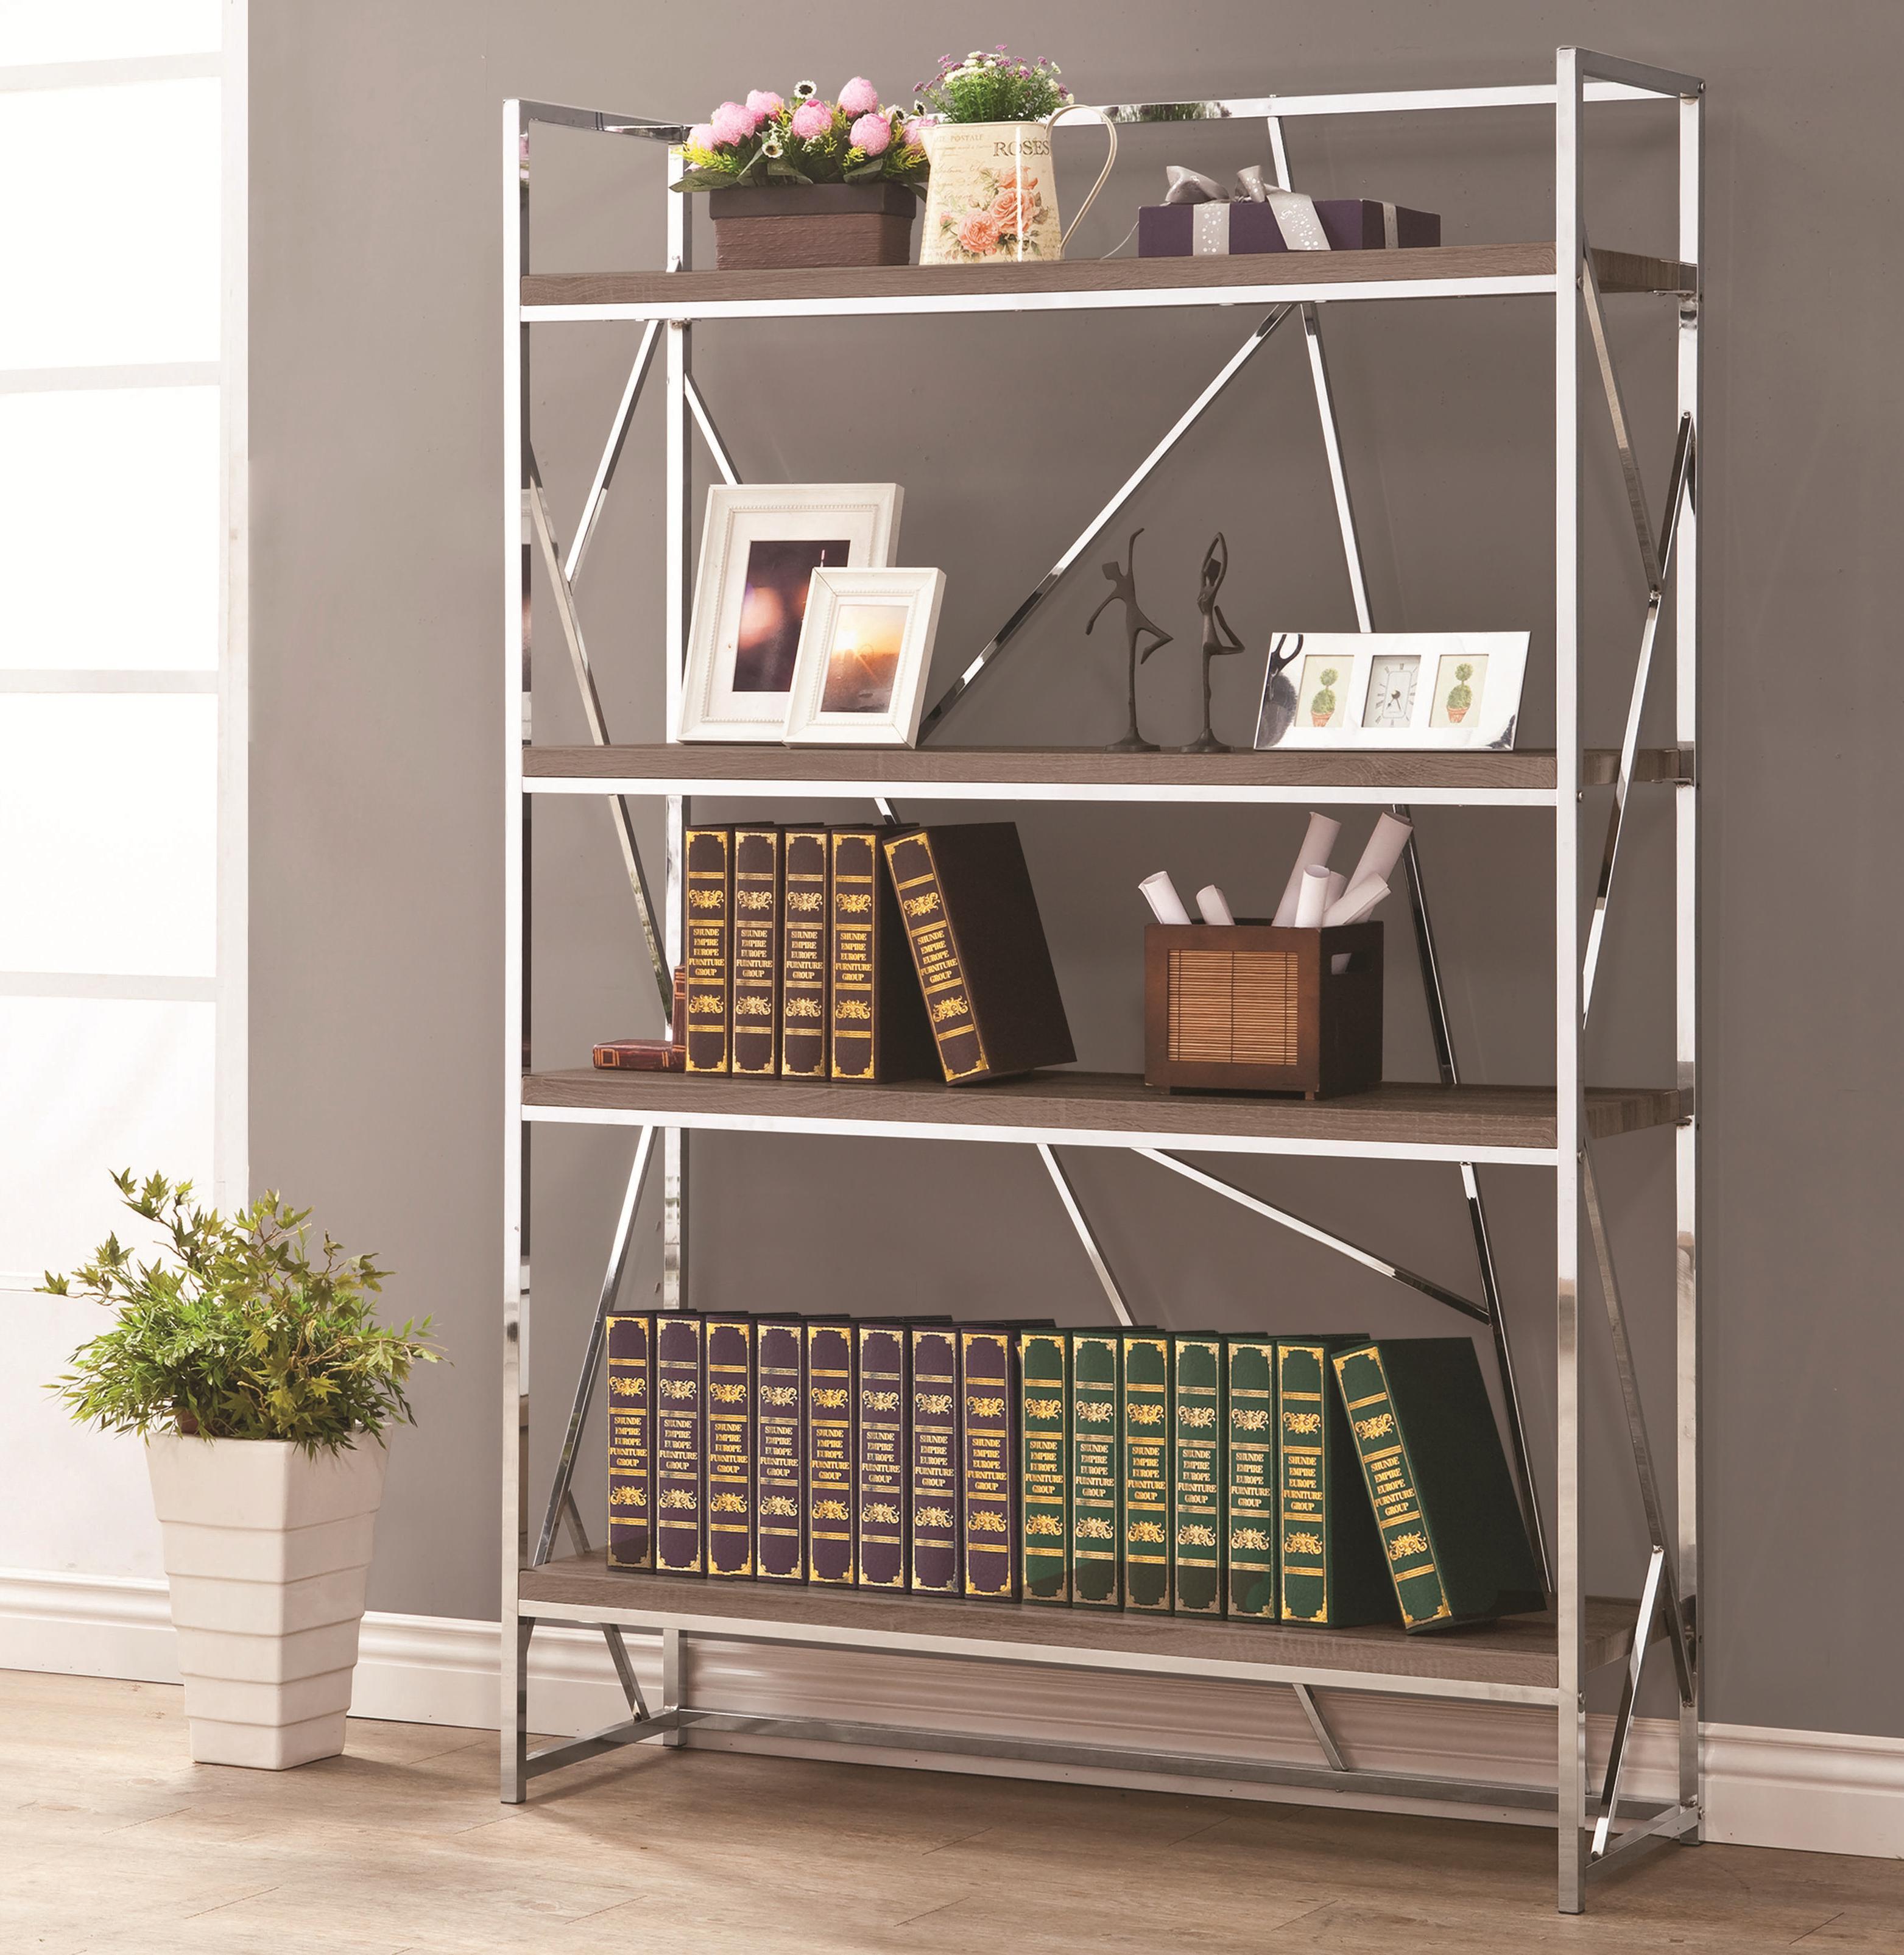 bins fabric bookcases ikea bookcase utility bookshelf shelf with black tower